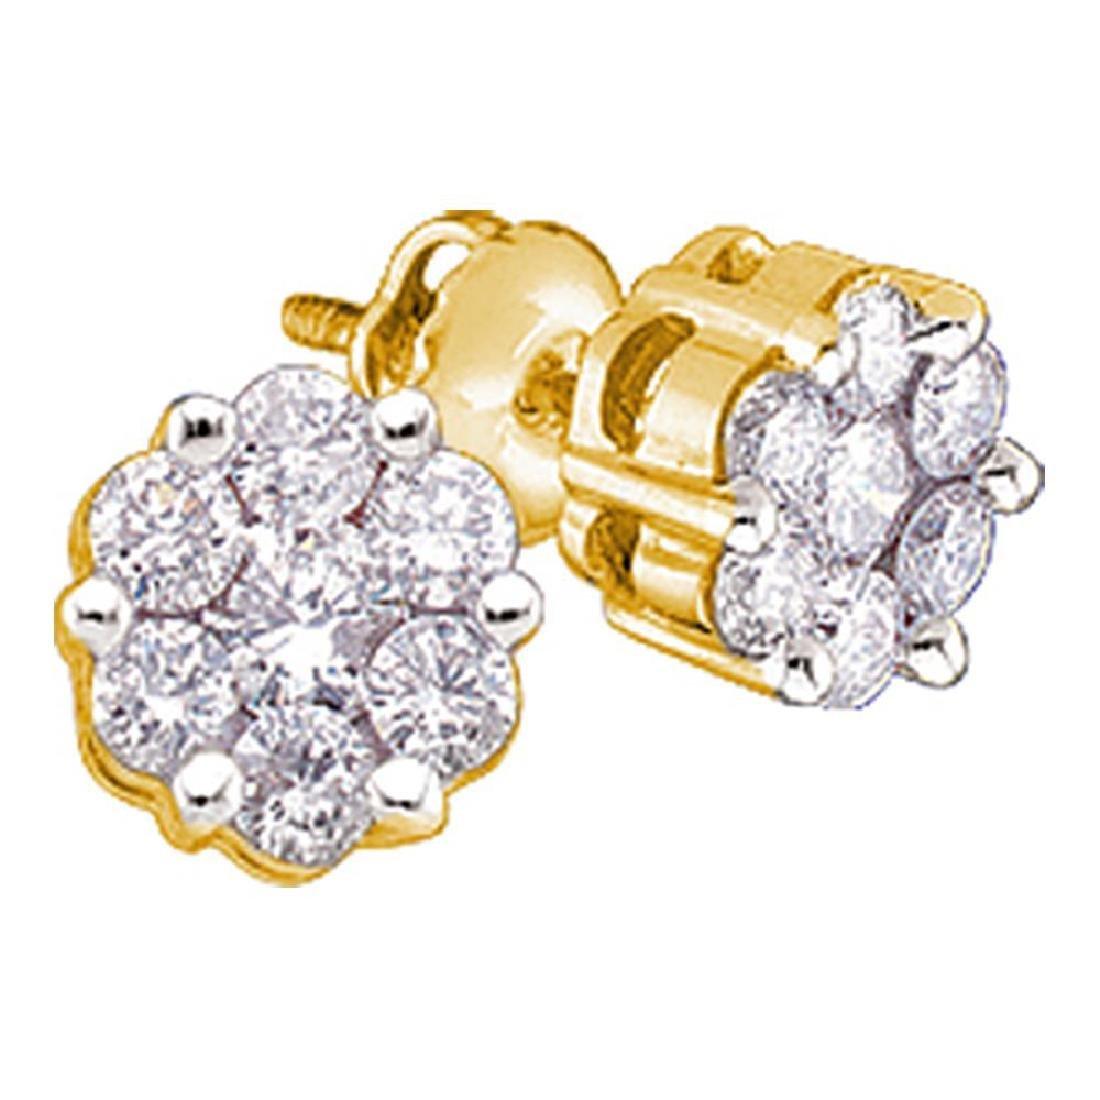 0.15 CTW Diamond Flower Screwback Stud Earrings 14k